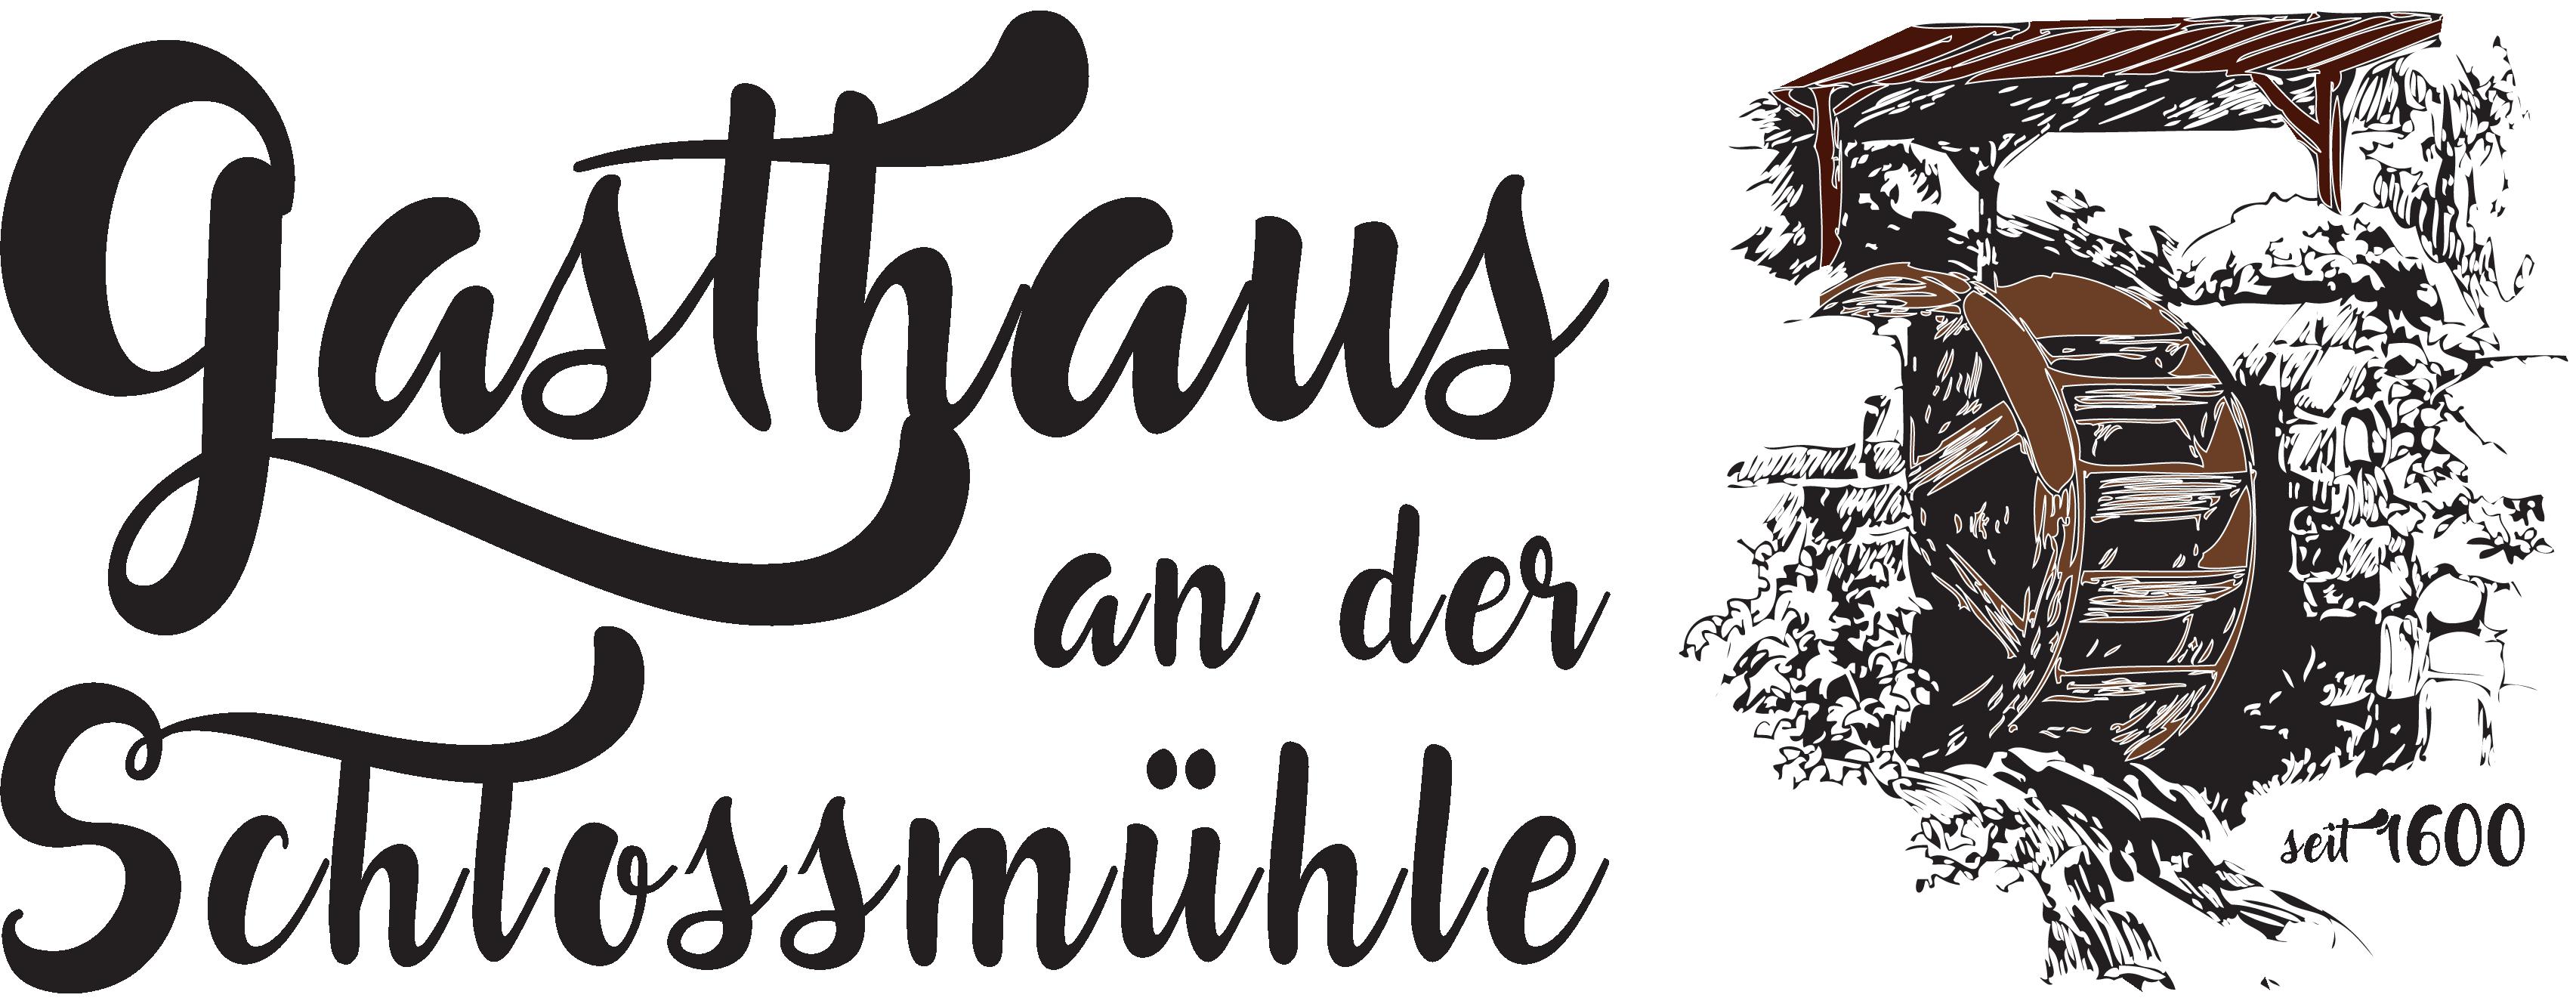 Gasthaus an der Schlossmhle Logo